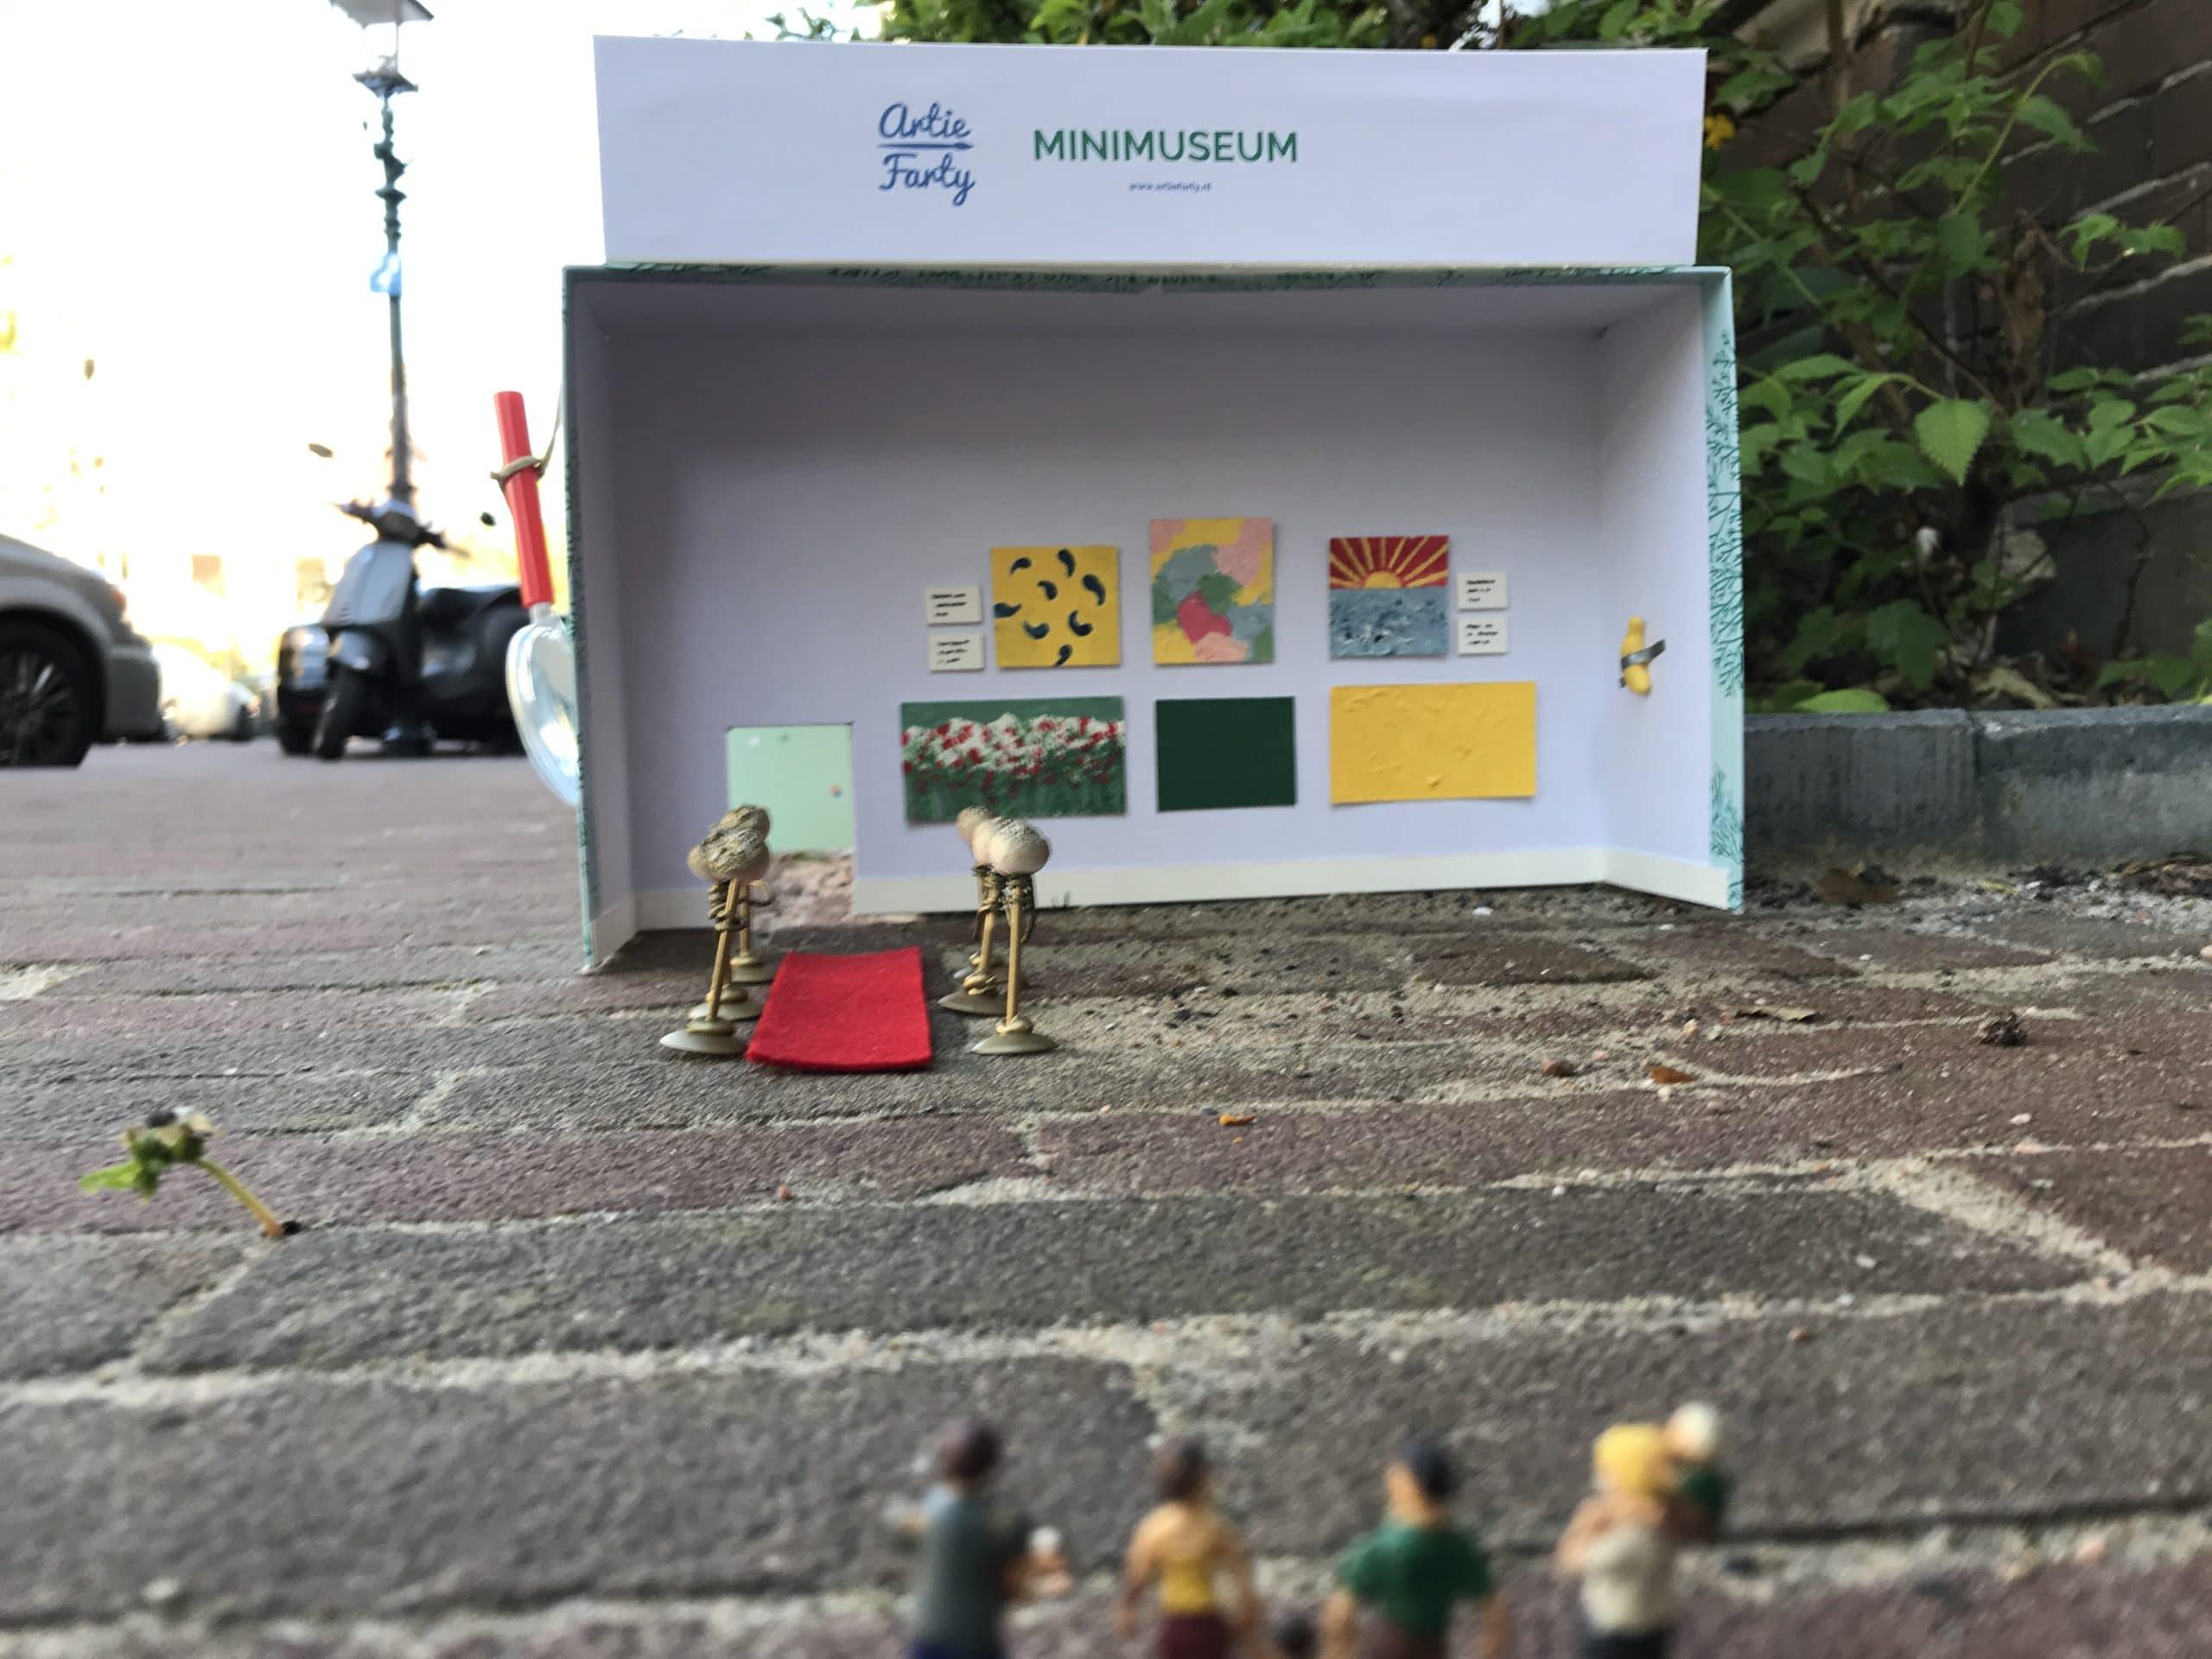 Minimuseum publiek